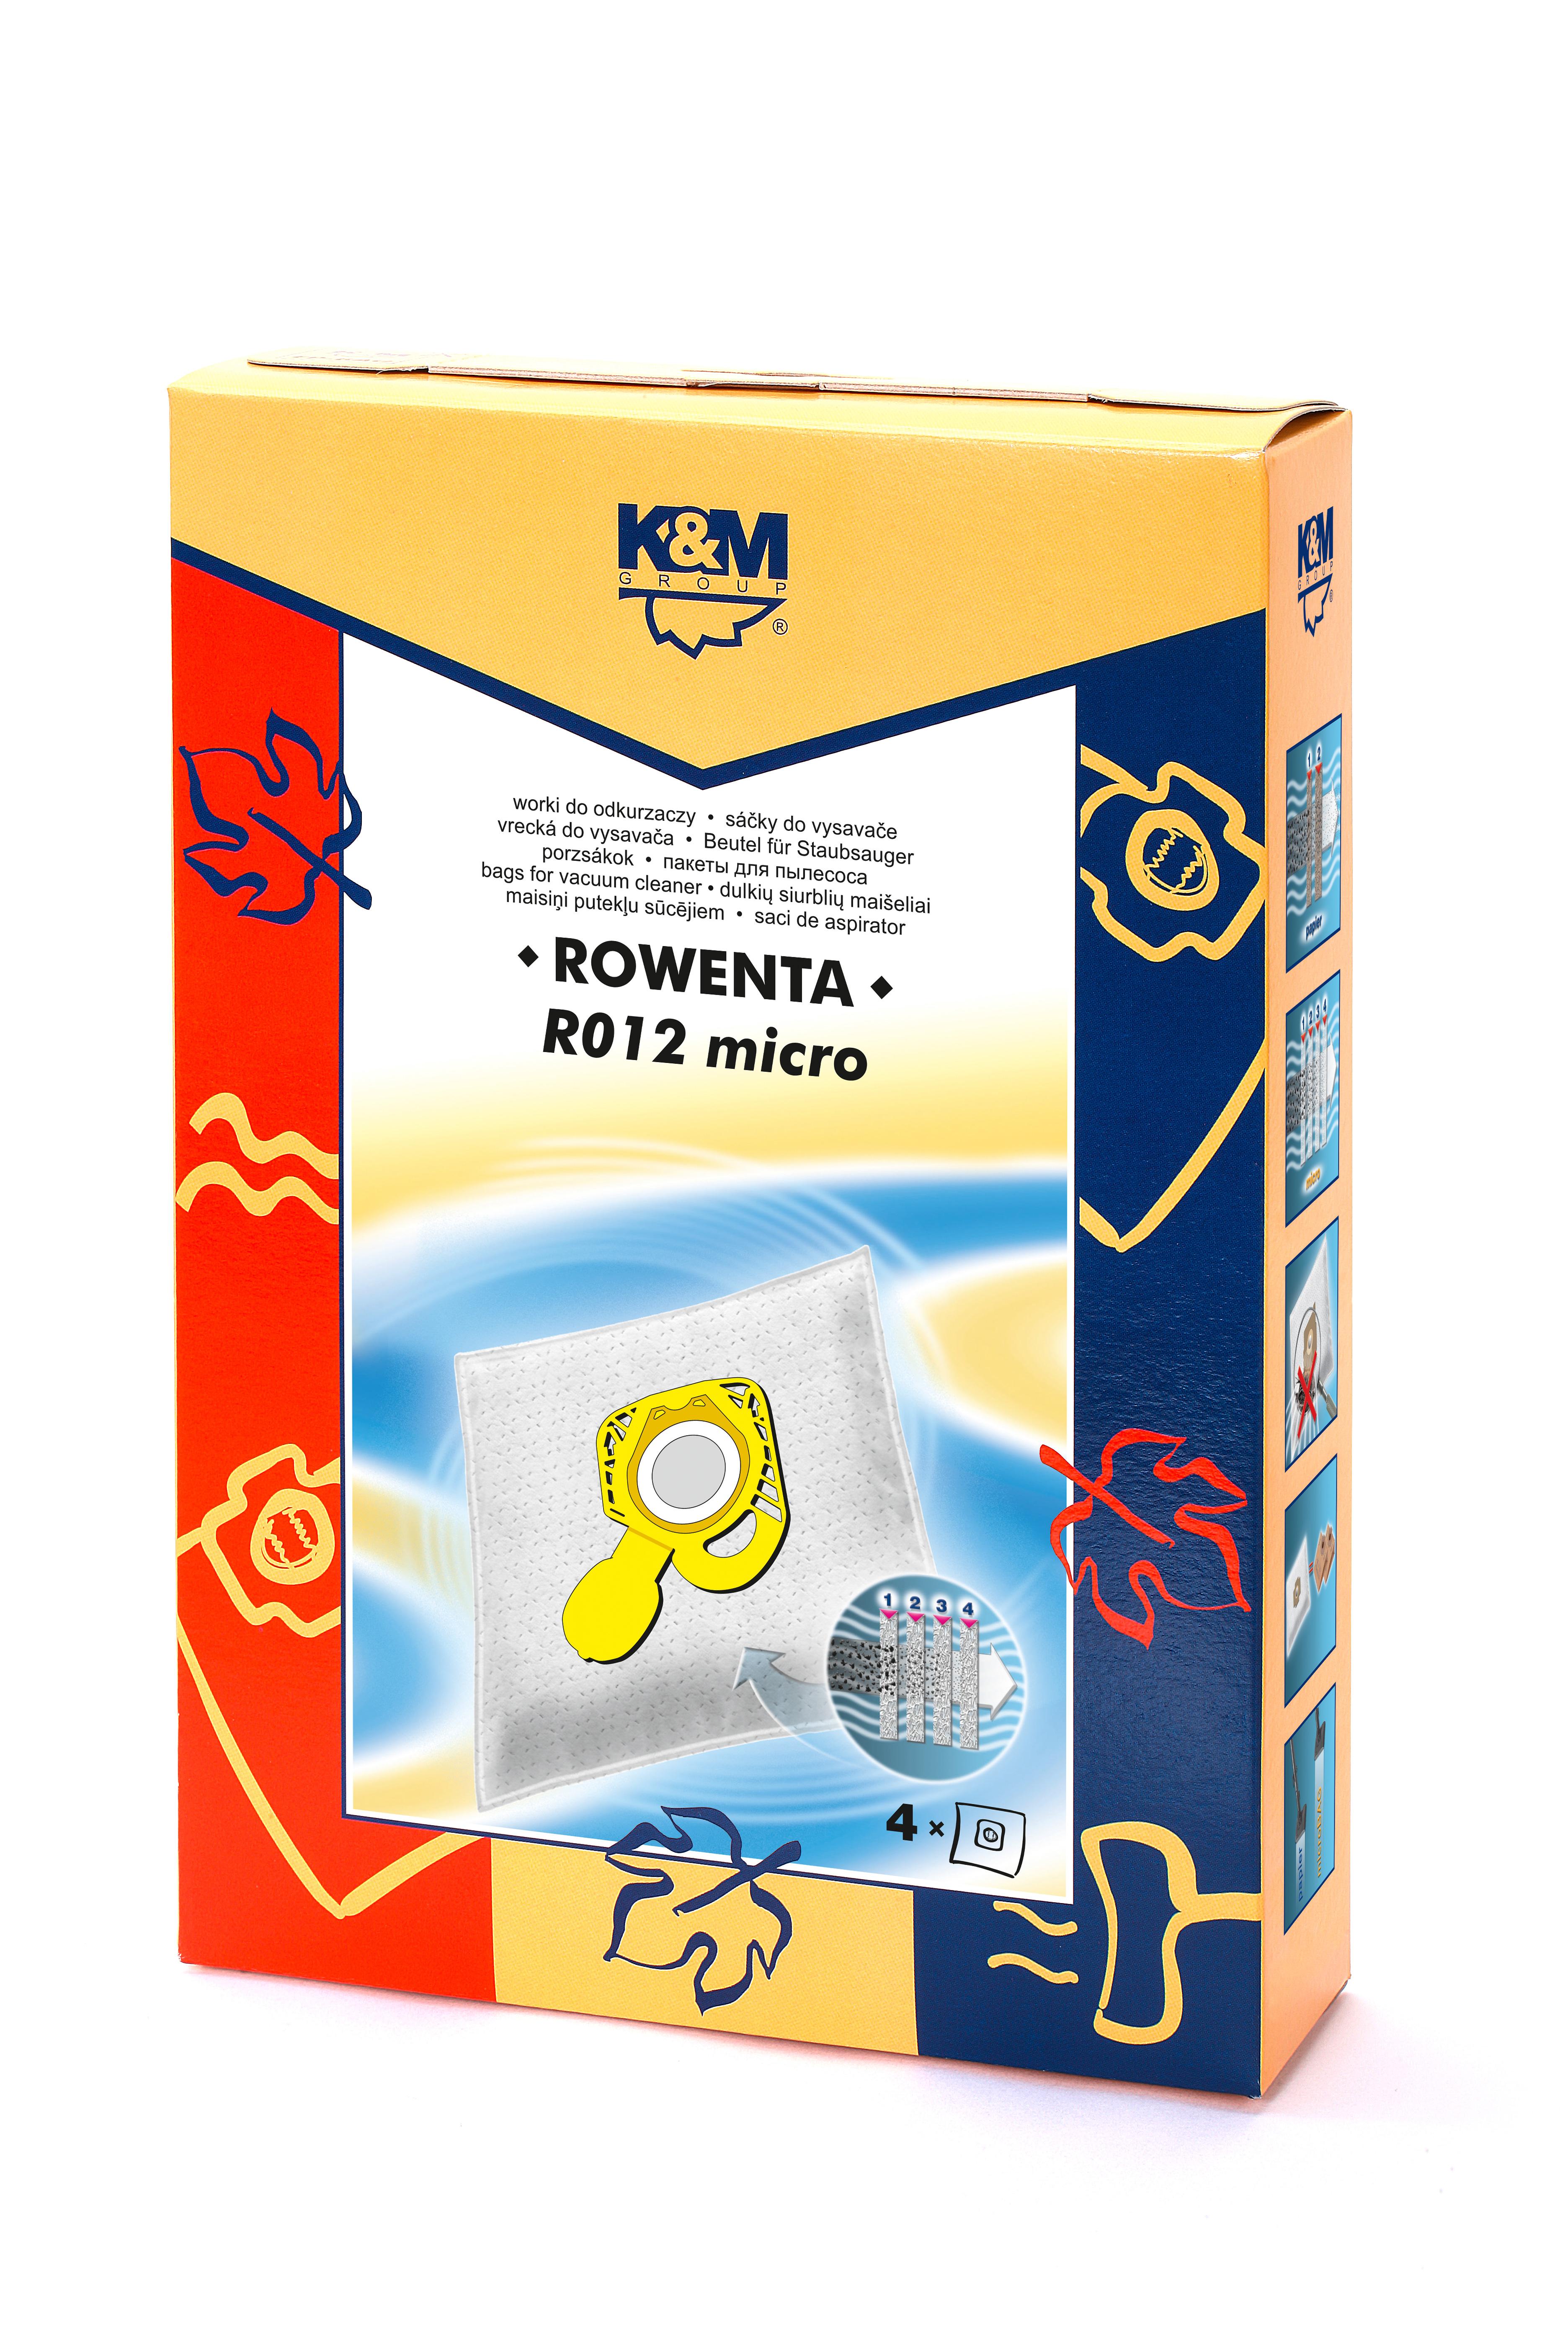 Sac aspirator Rowenta, sintetic, 4X saci, K&M 0